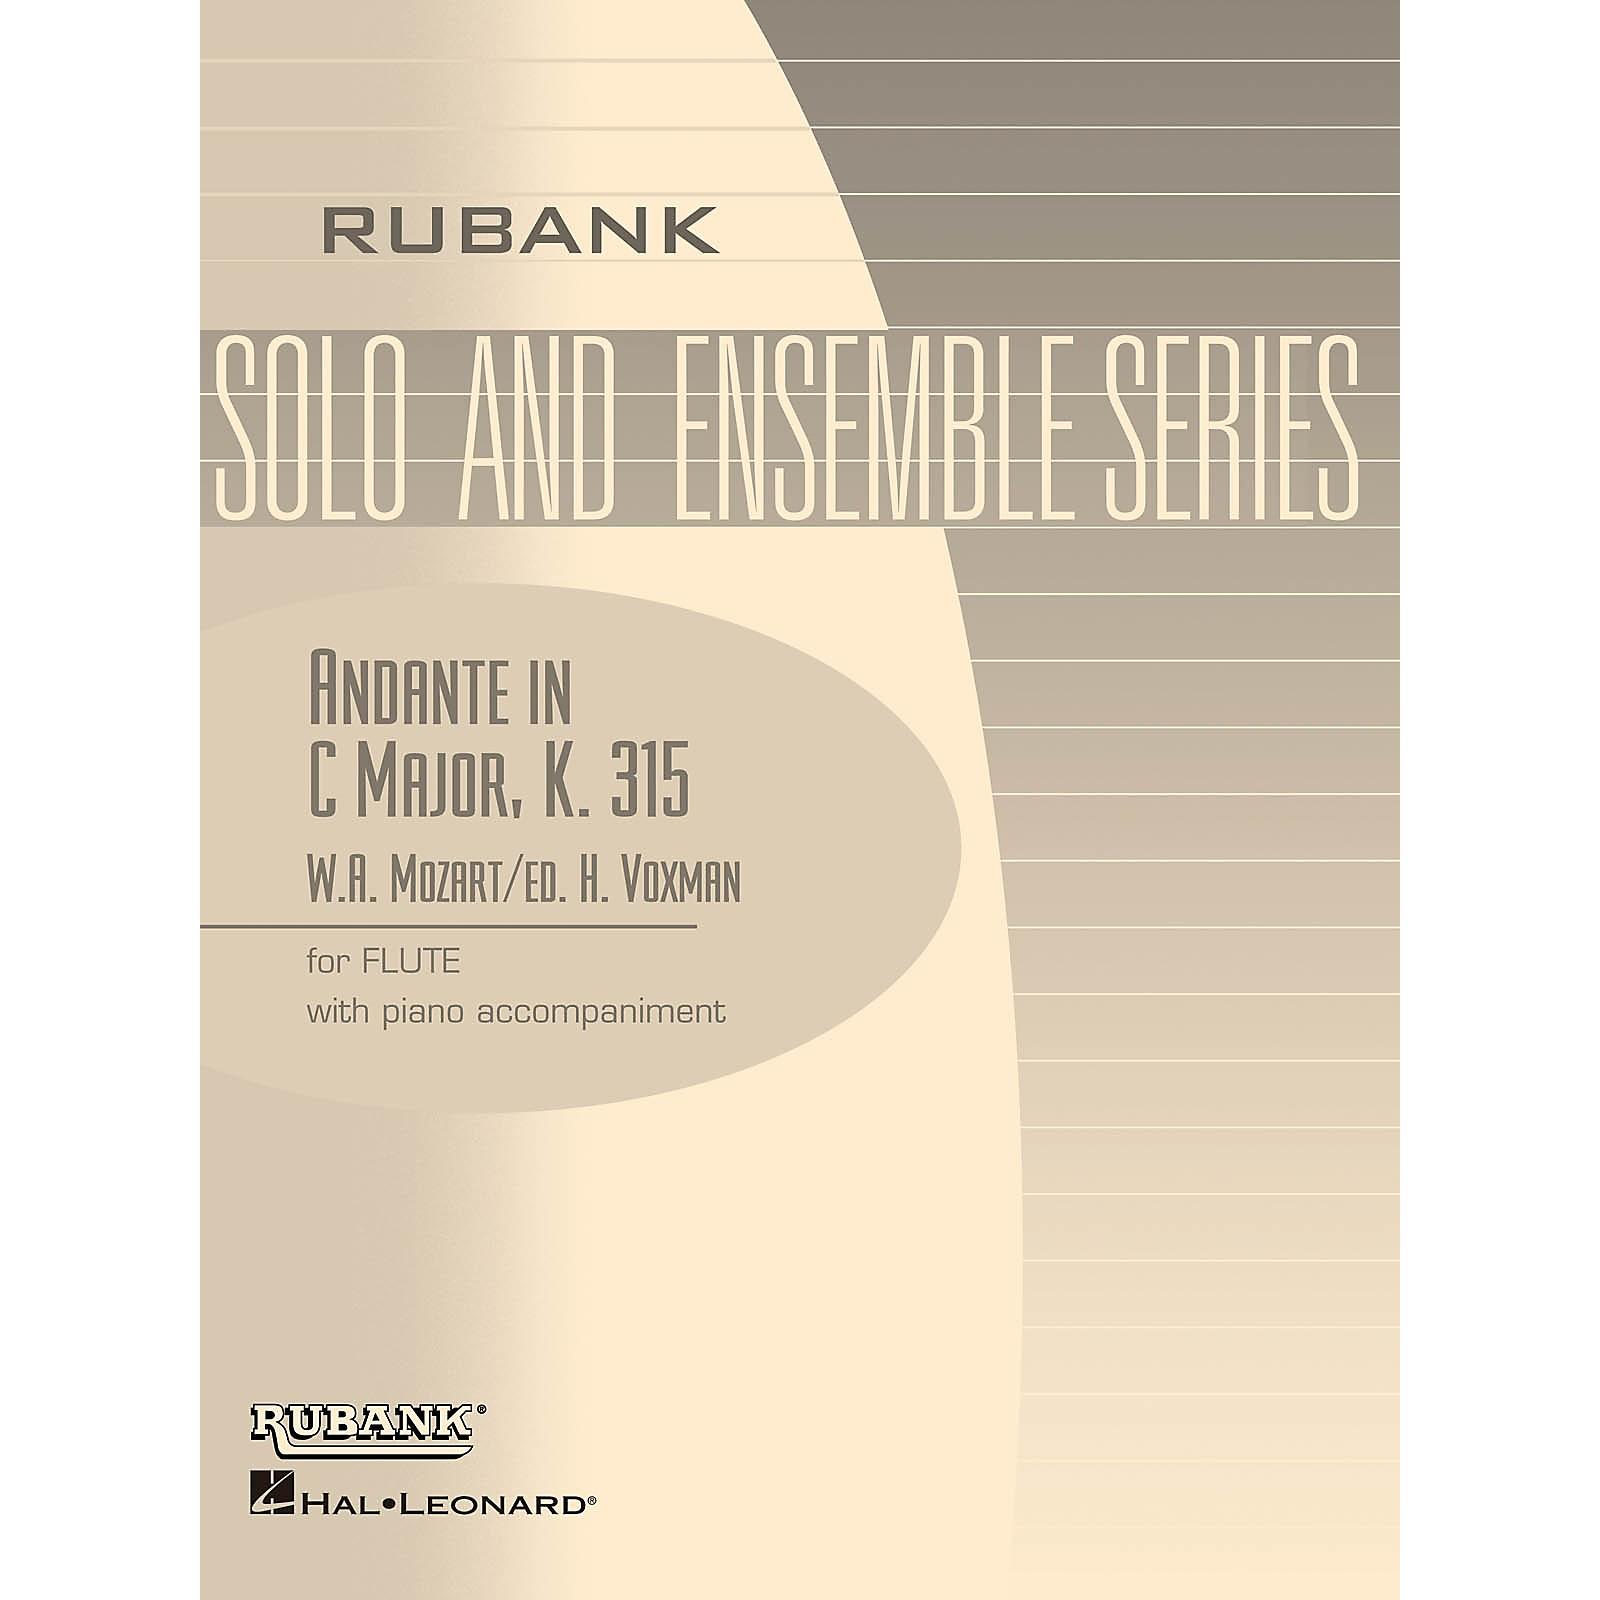 Rubank Publications Andante in C Major, K. 315 (Flute Solo with Piano - Grade 4) Rubank Solo/Ensemble Sheet Series